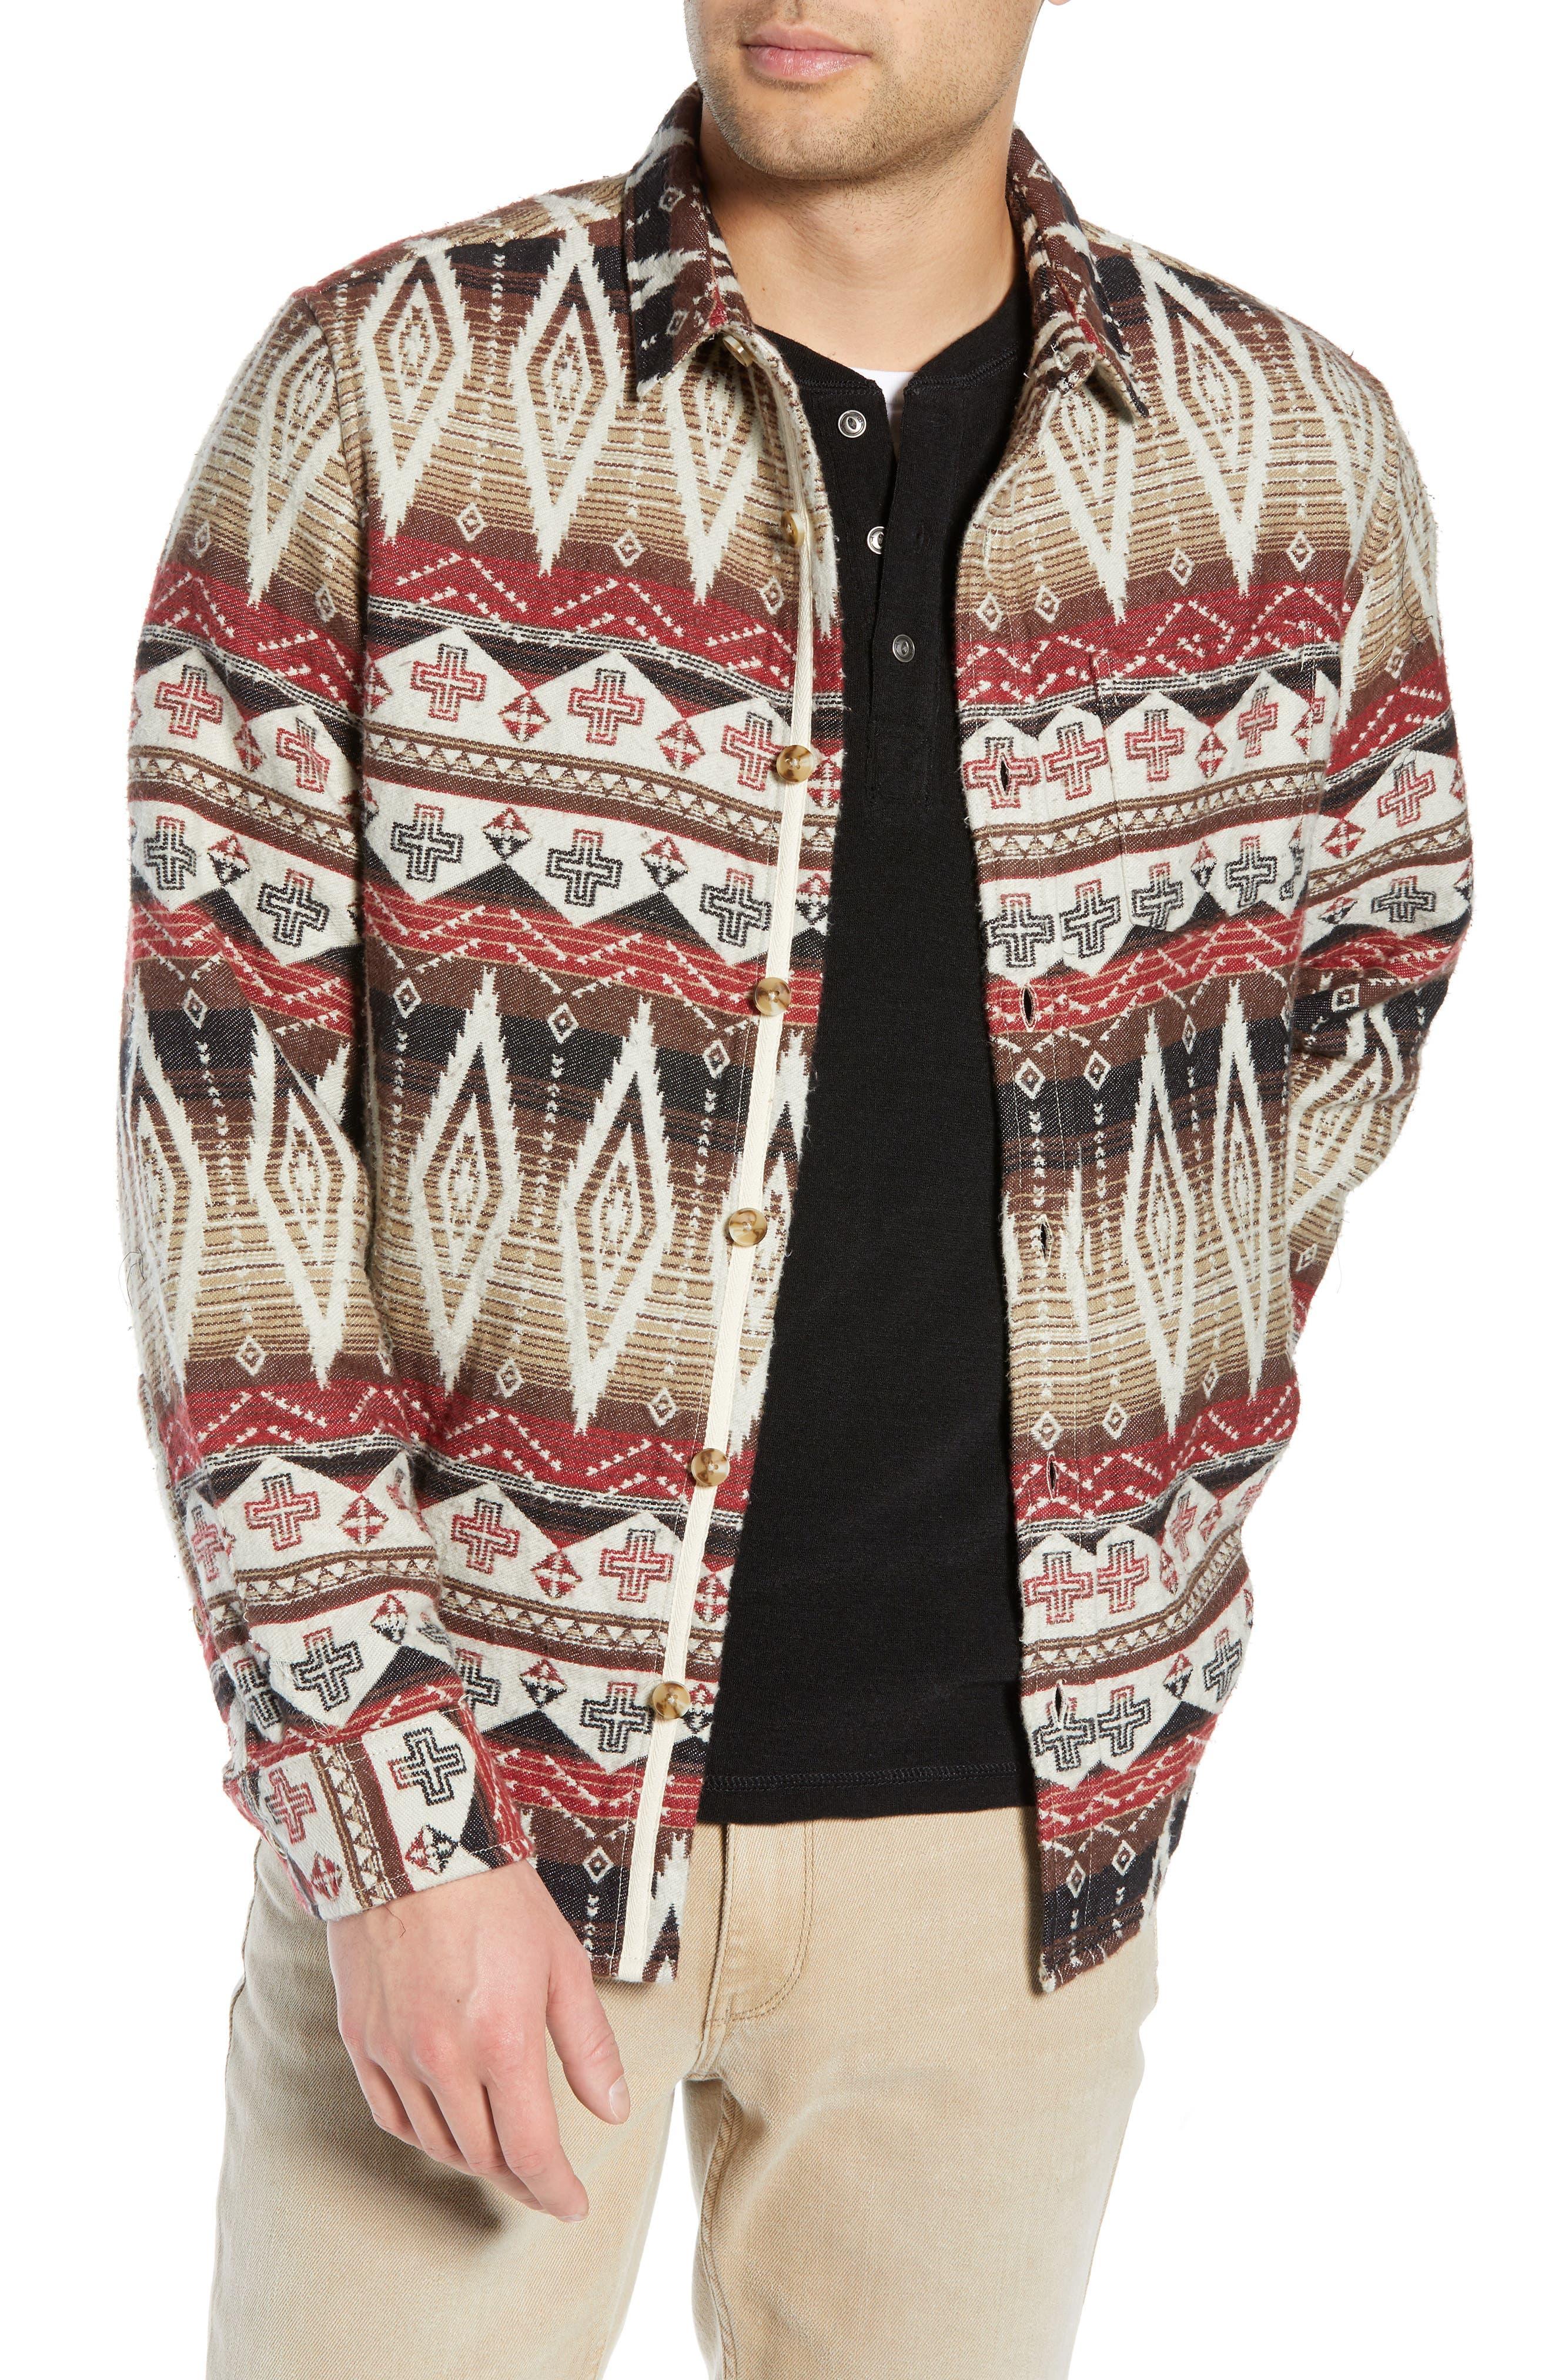 Geo Blanket Shirt Jacket,                         Main,                         color, BEIGE RAINY DAY TRIBAL PRINT